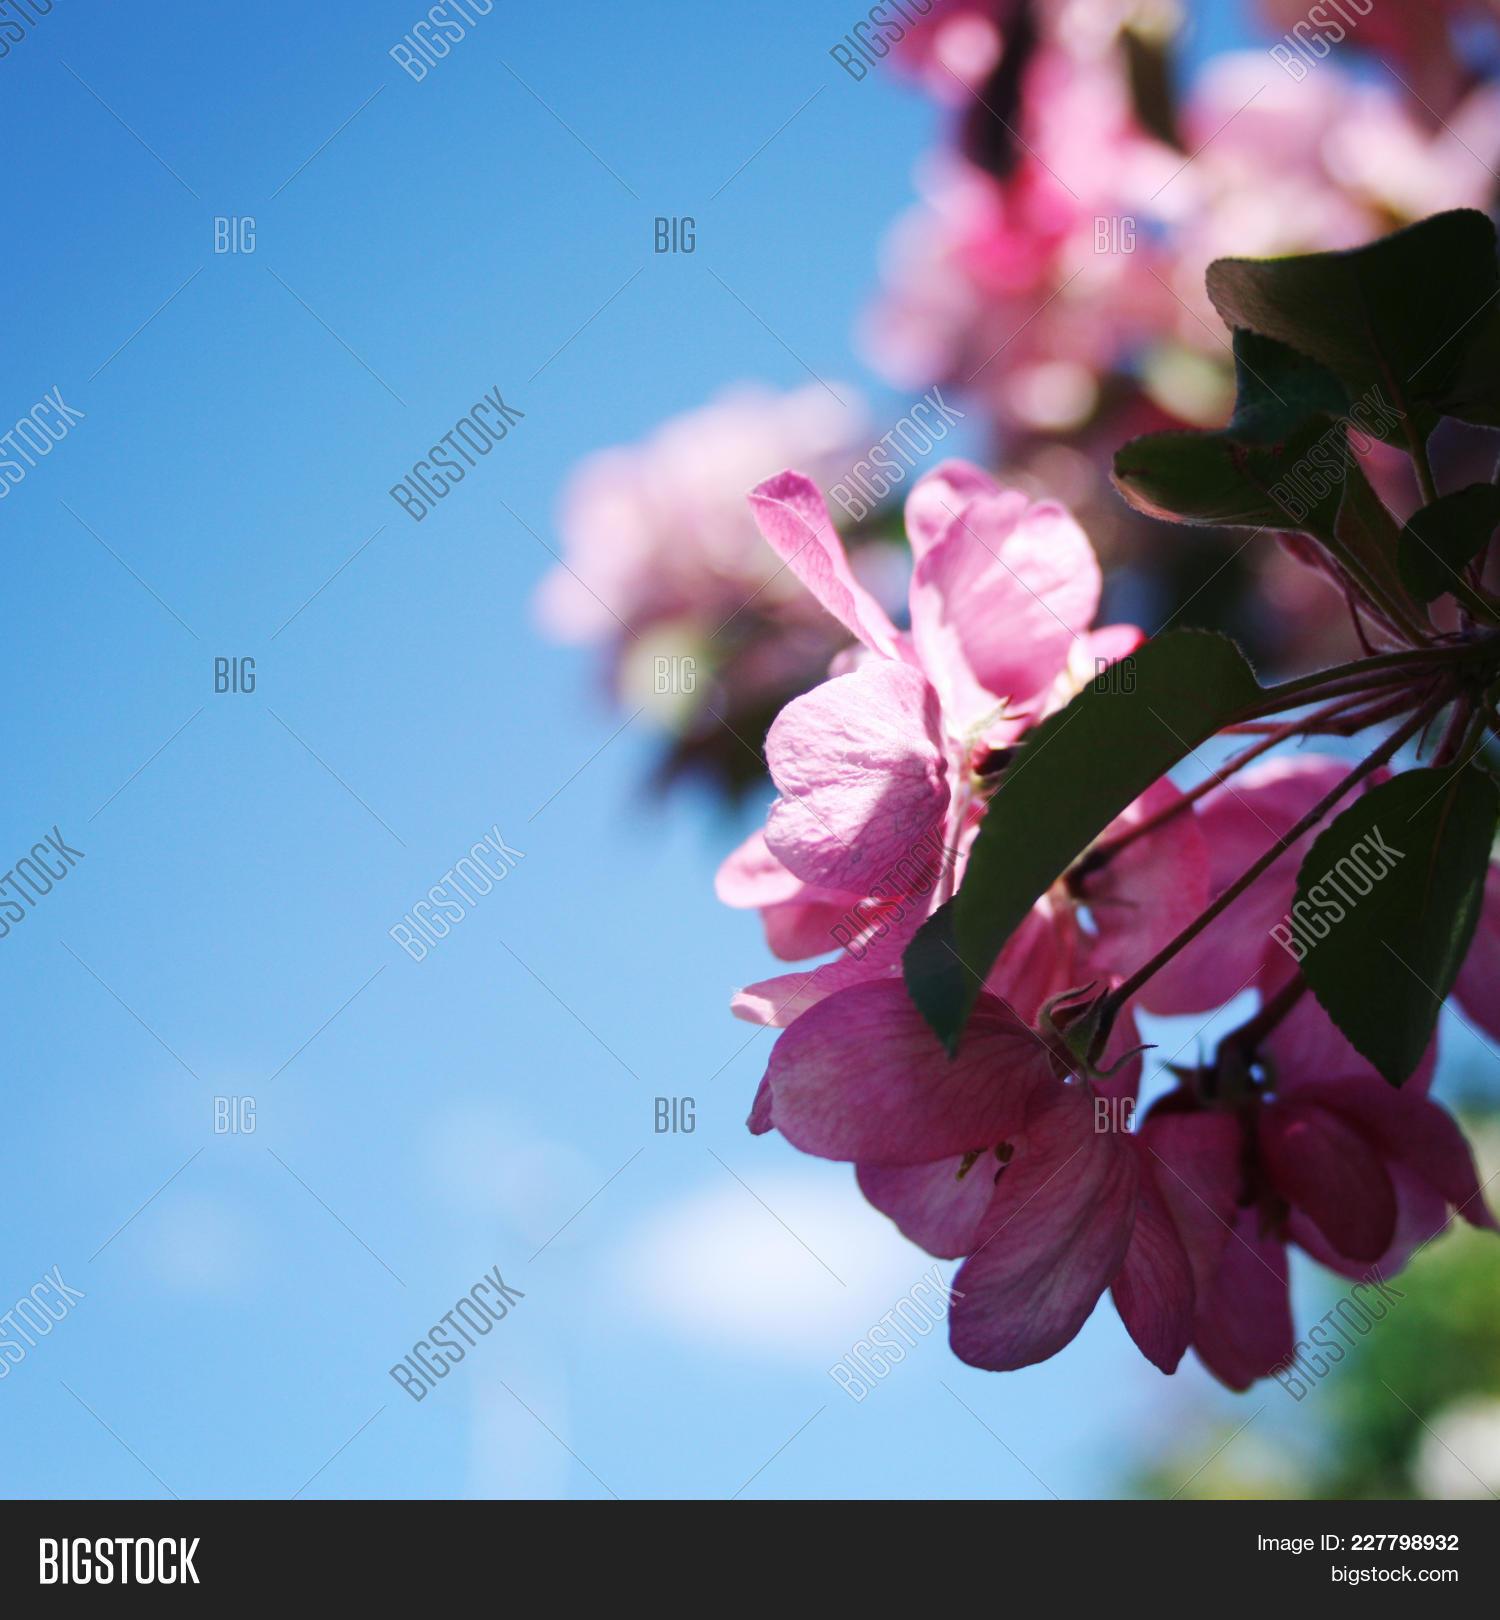 Pink Apple Flowers Image Photo Free Trial Bigstock